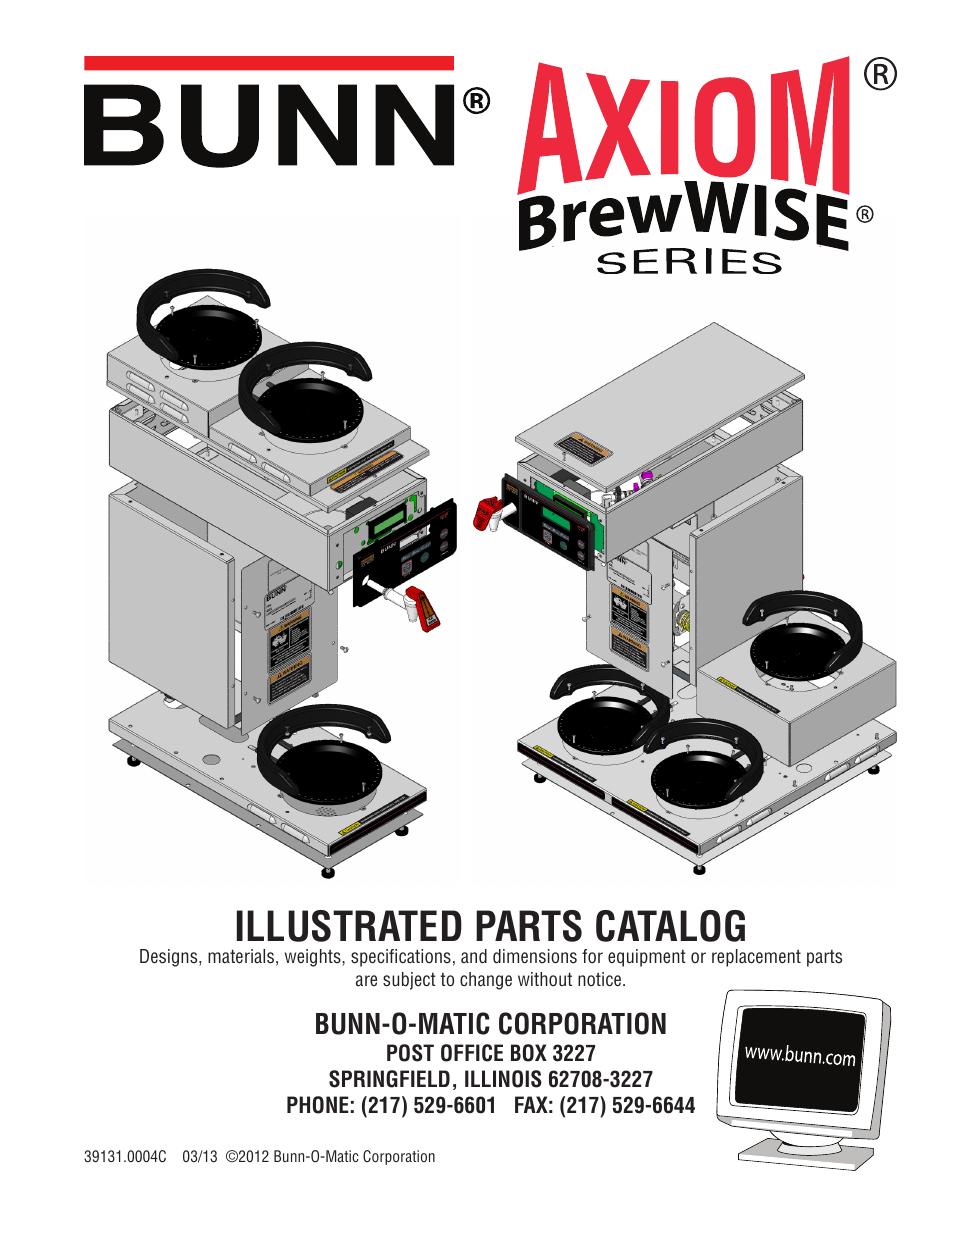 Bunn Axiom Brewwise 391310004b User Manual 19 Pages Parts Catalog Wiring Diagram